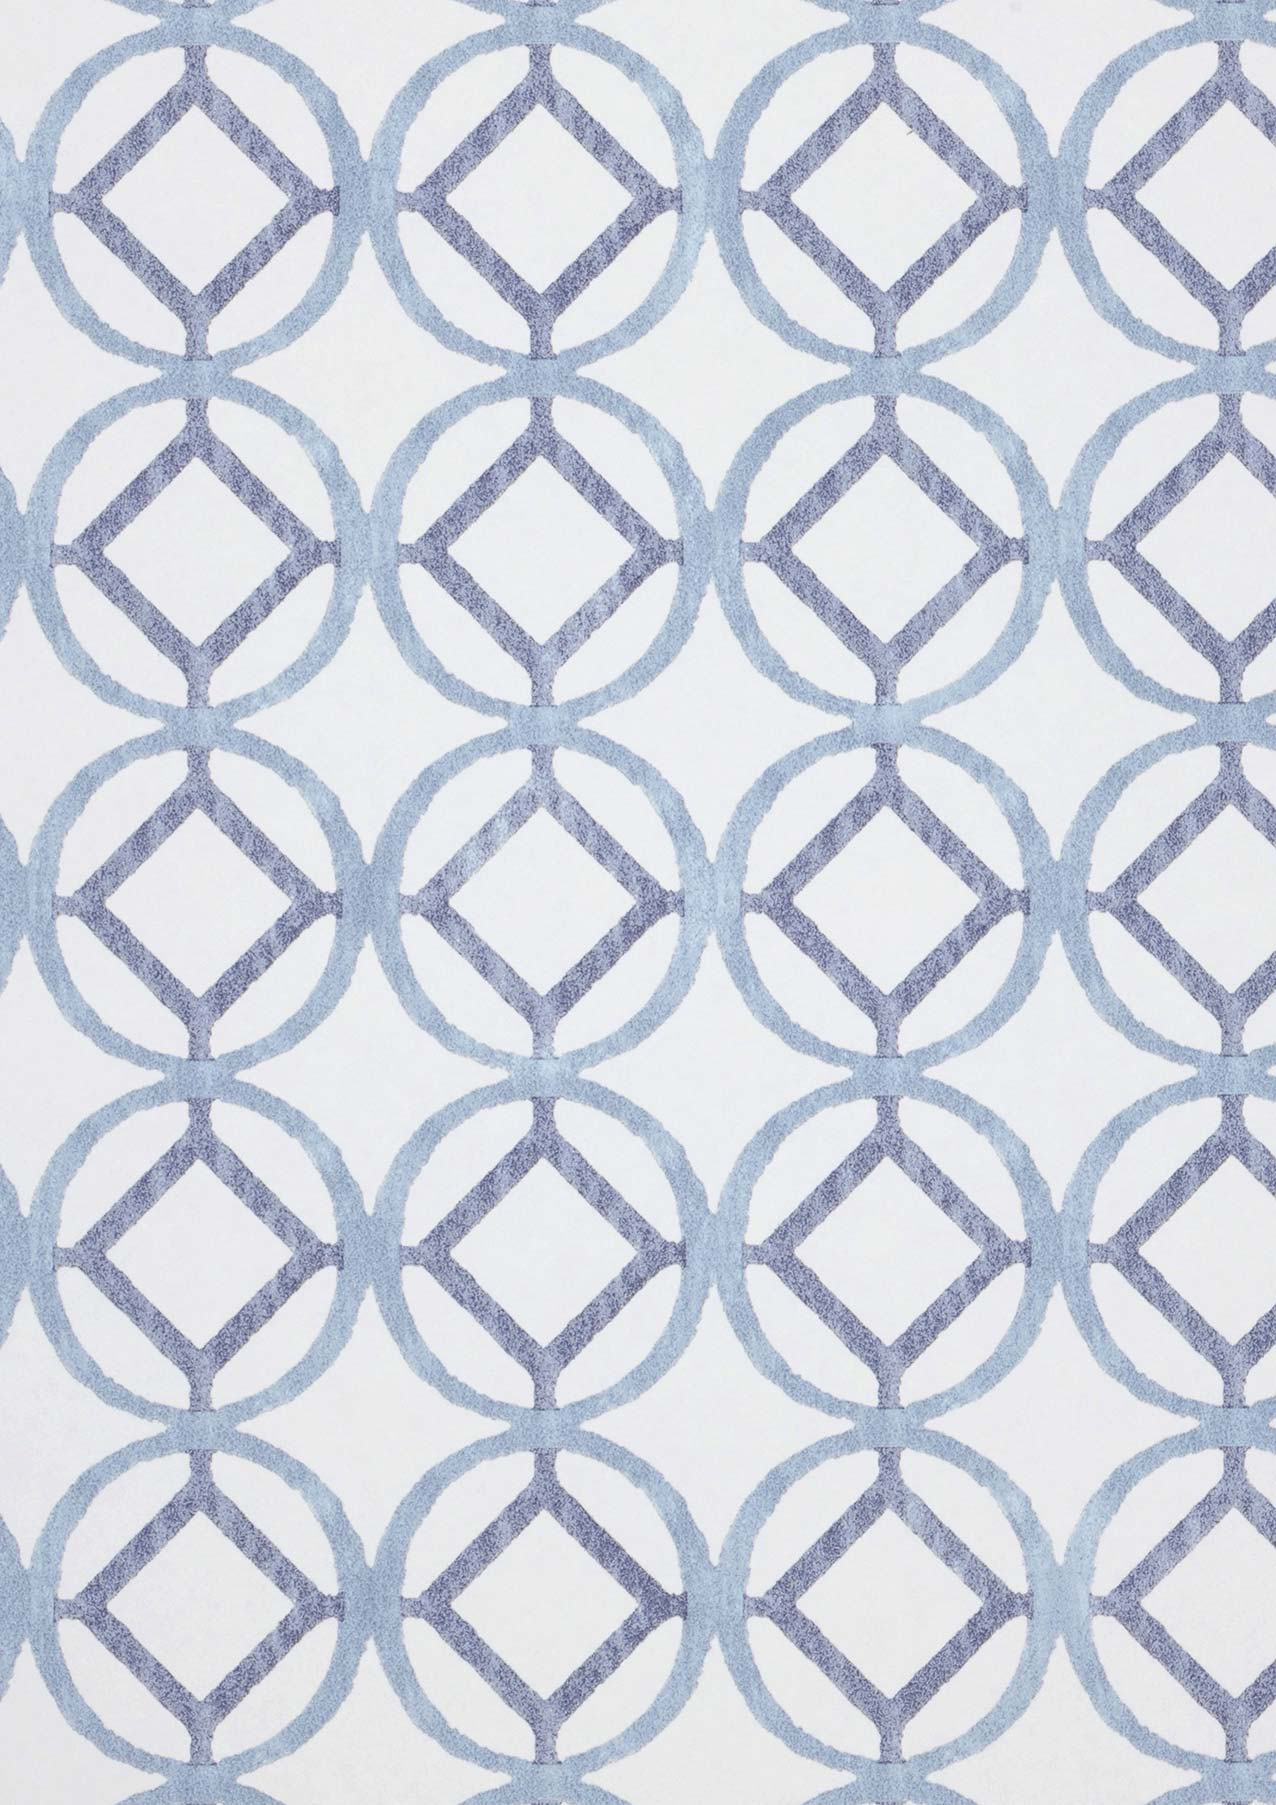 Tapete weiss graublau taubenblau tapeten der 70er for Tapete taubenblau